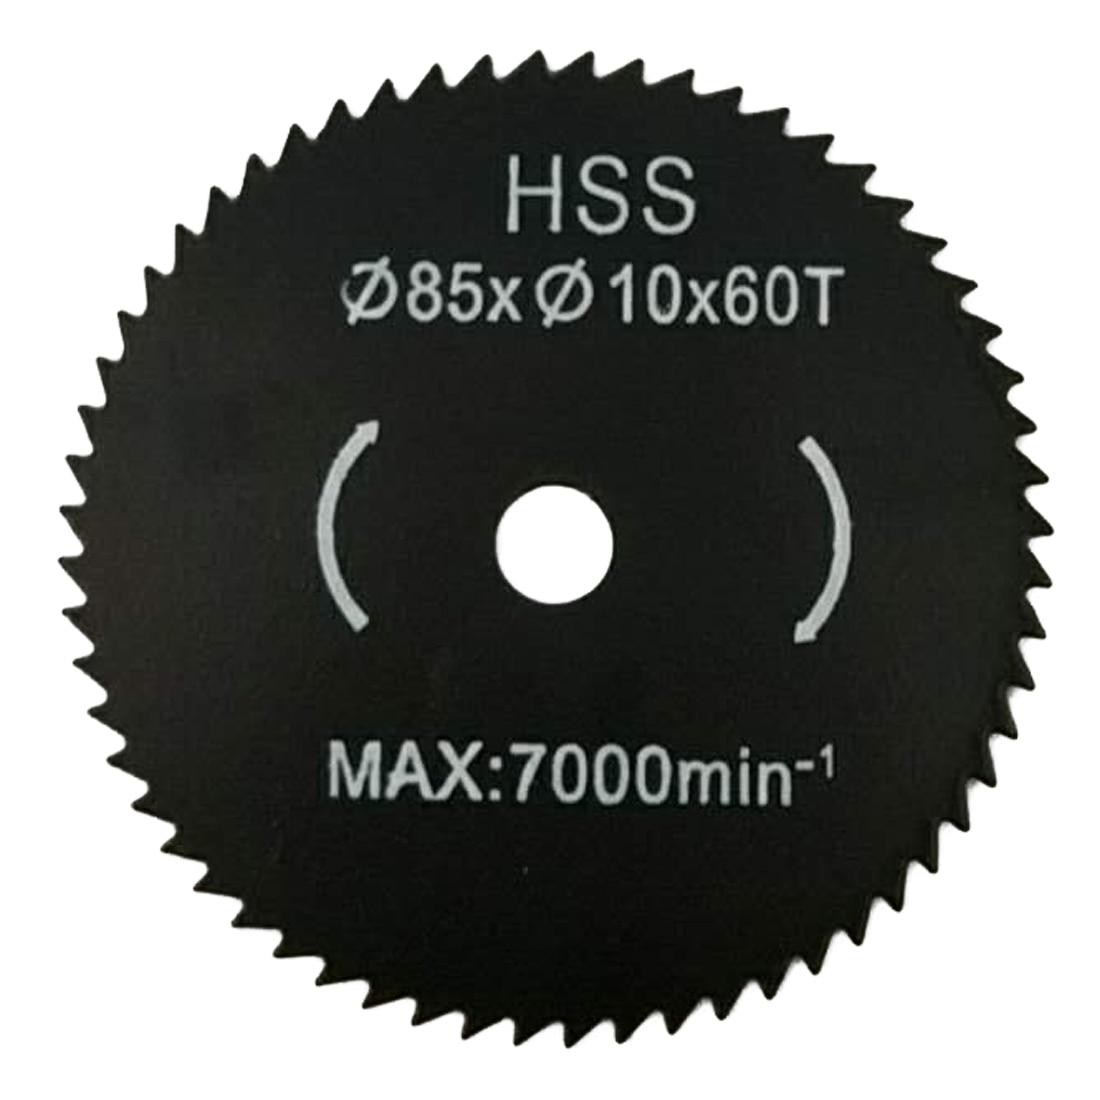 High Mini Circular Saw Blade Power Tool 1pc 60T Accessories Carbide Wood Metal Plastic Cutting Saw Blade Rotary Tools